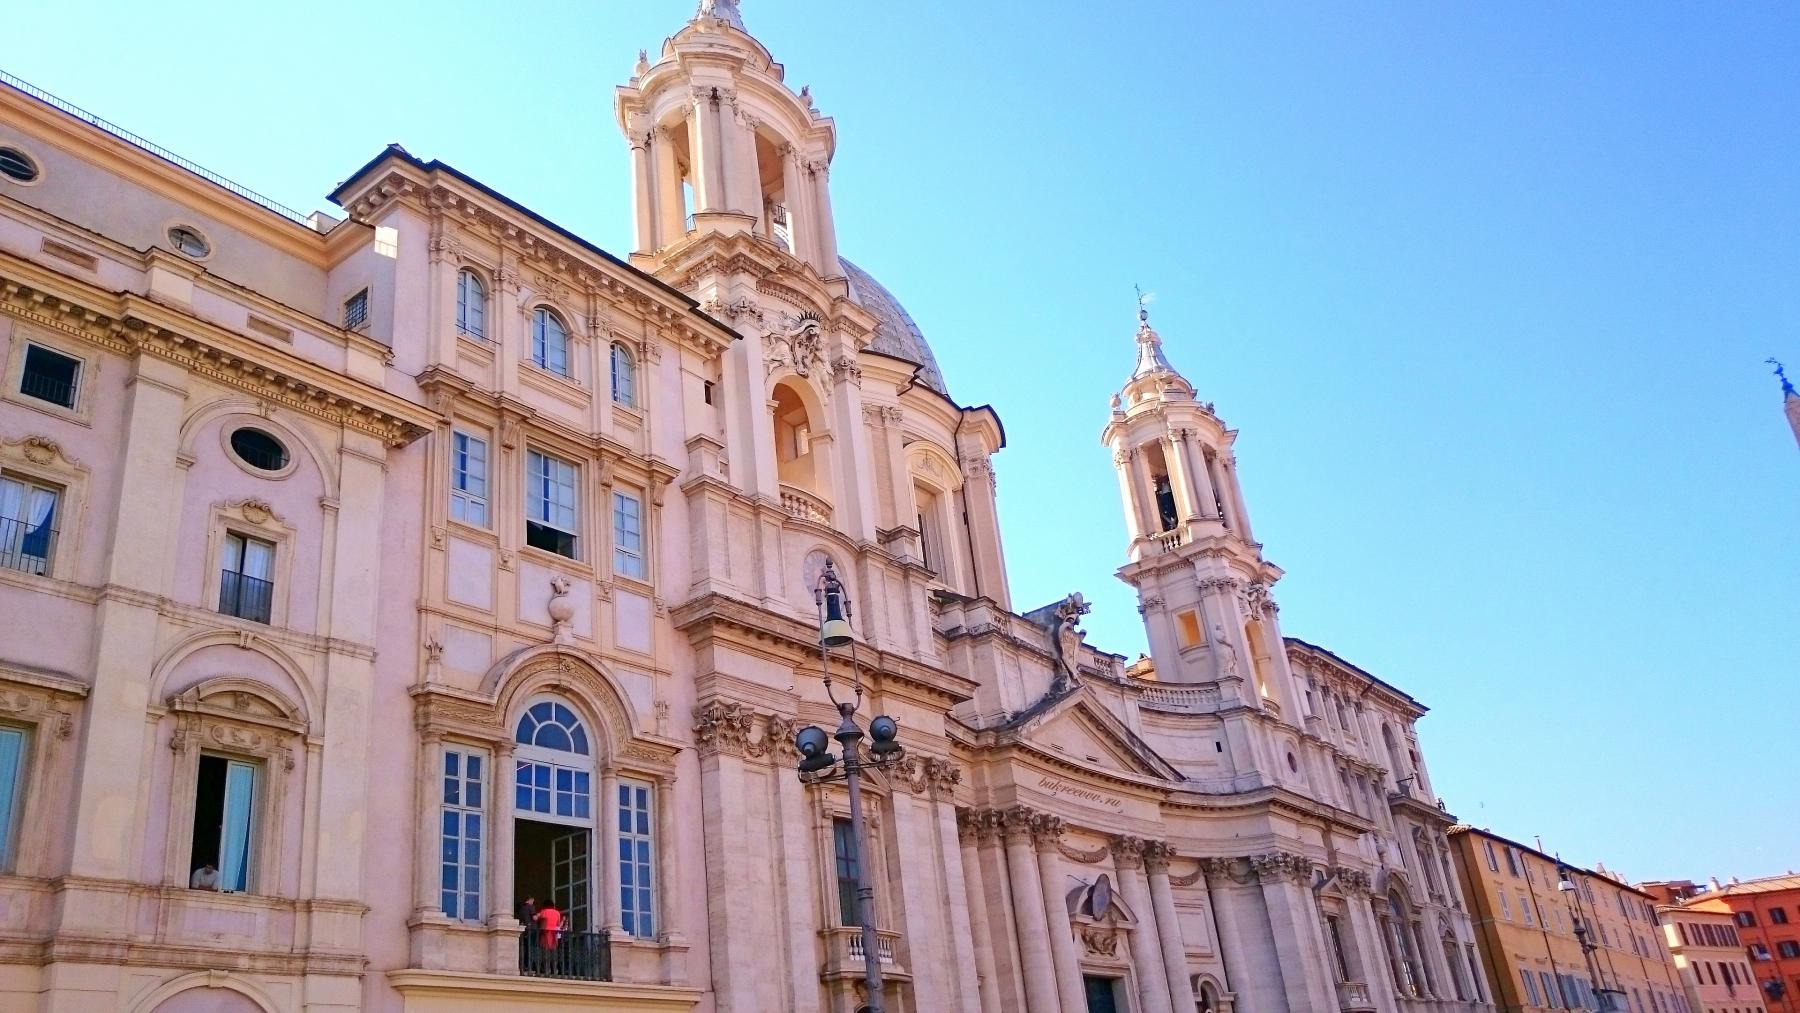 Piazza Navona 57